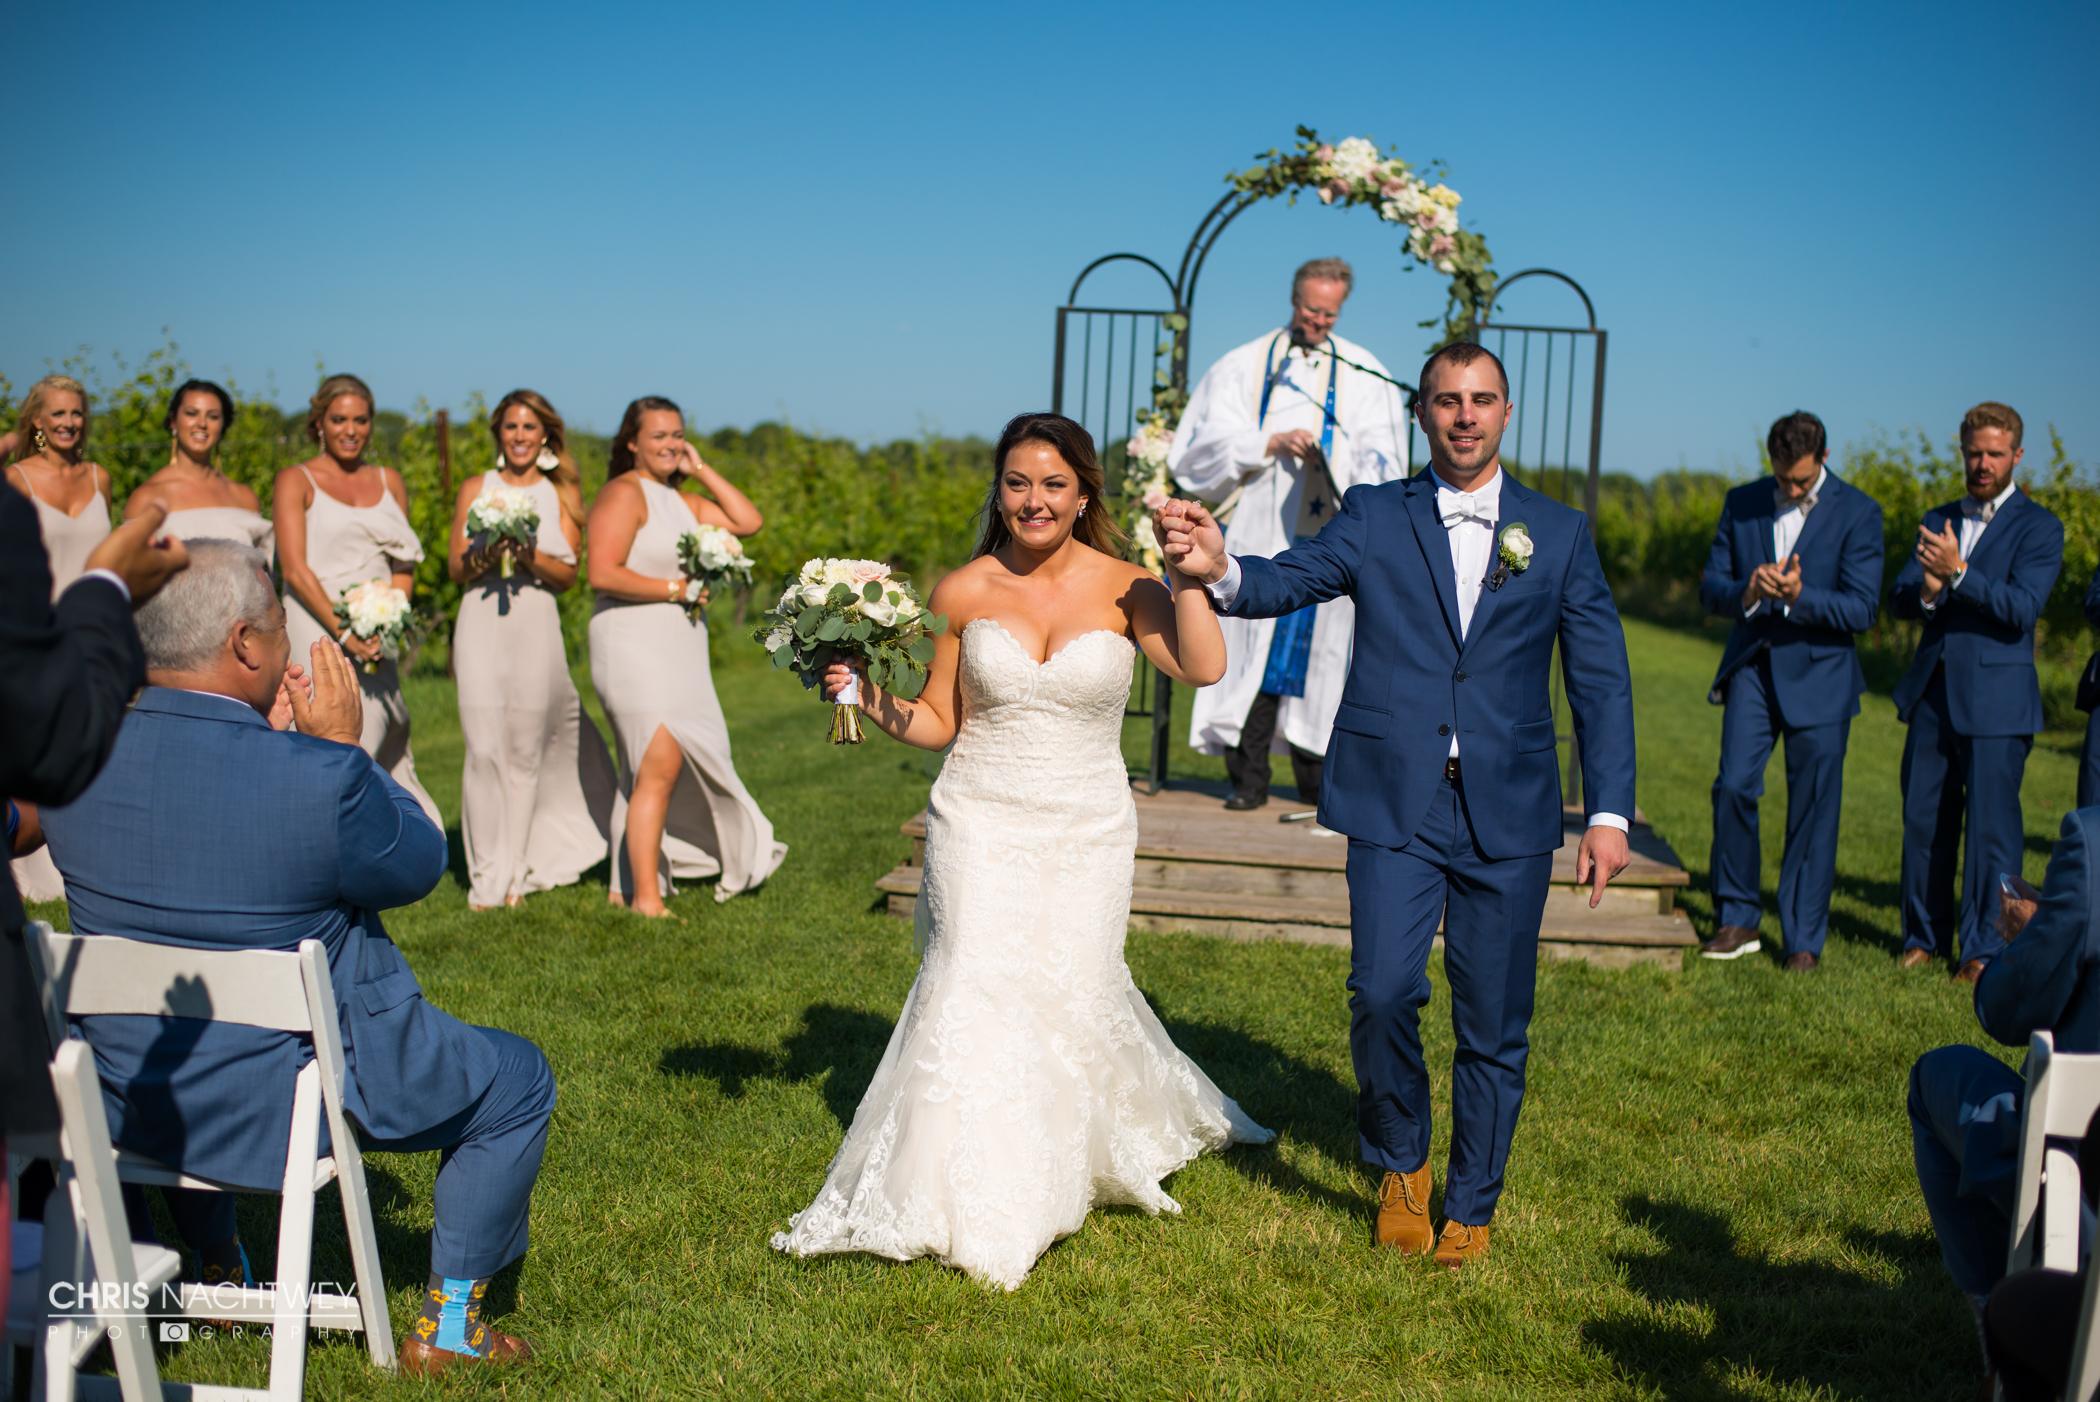 saltwater-farm-vineyard-wedding-photos-lindsay-gabe-chris-nachtwey-photography-2017-39.jpg